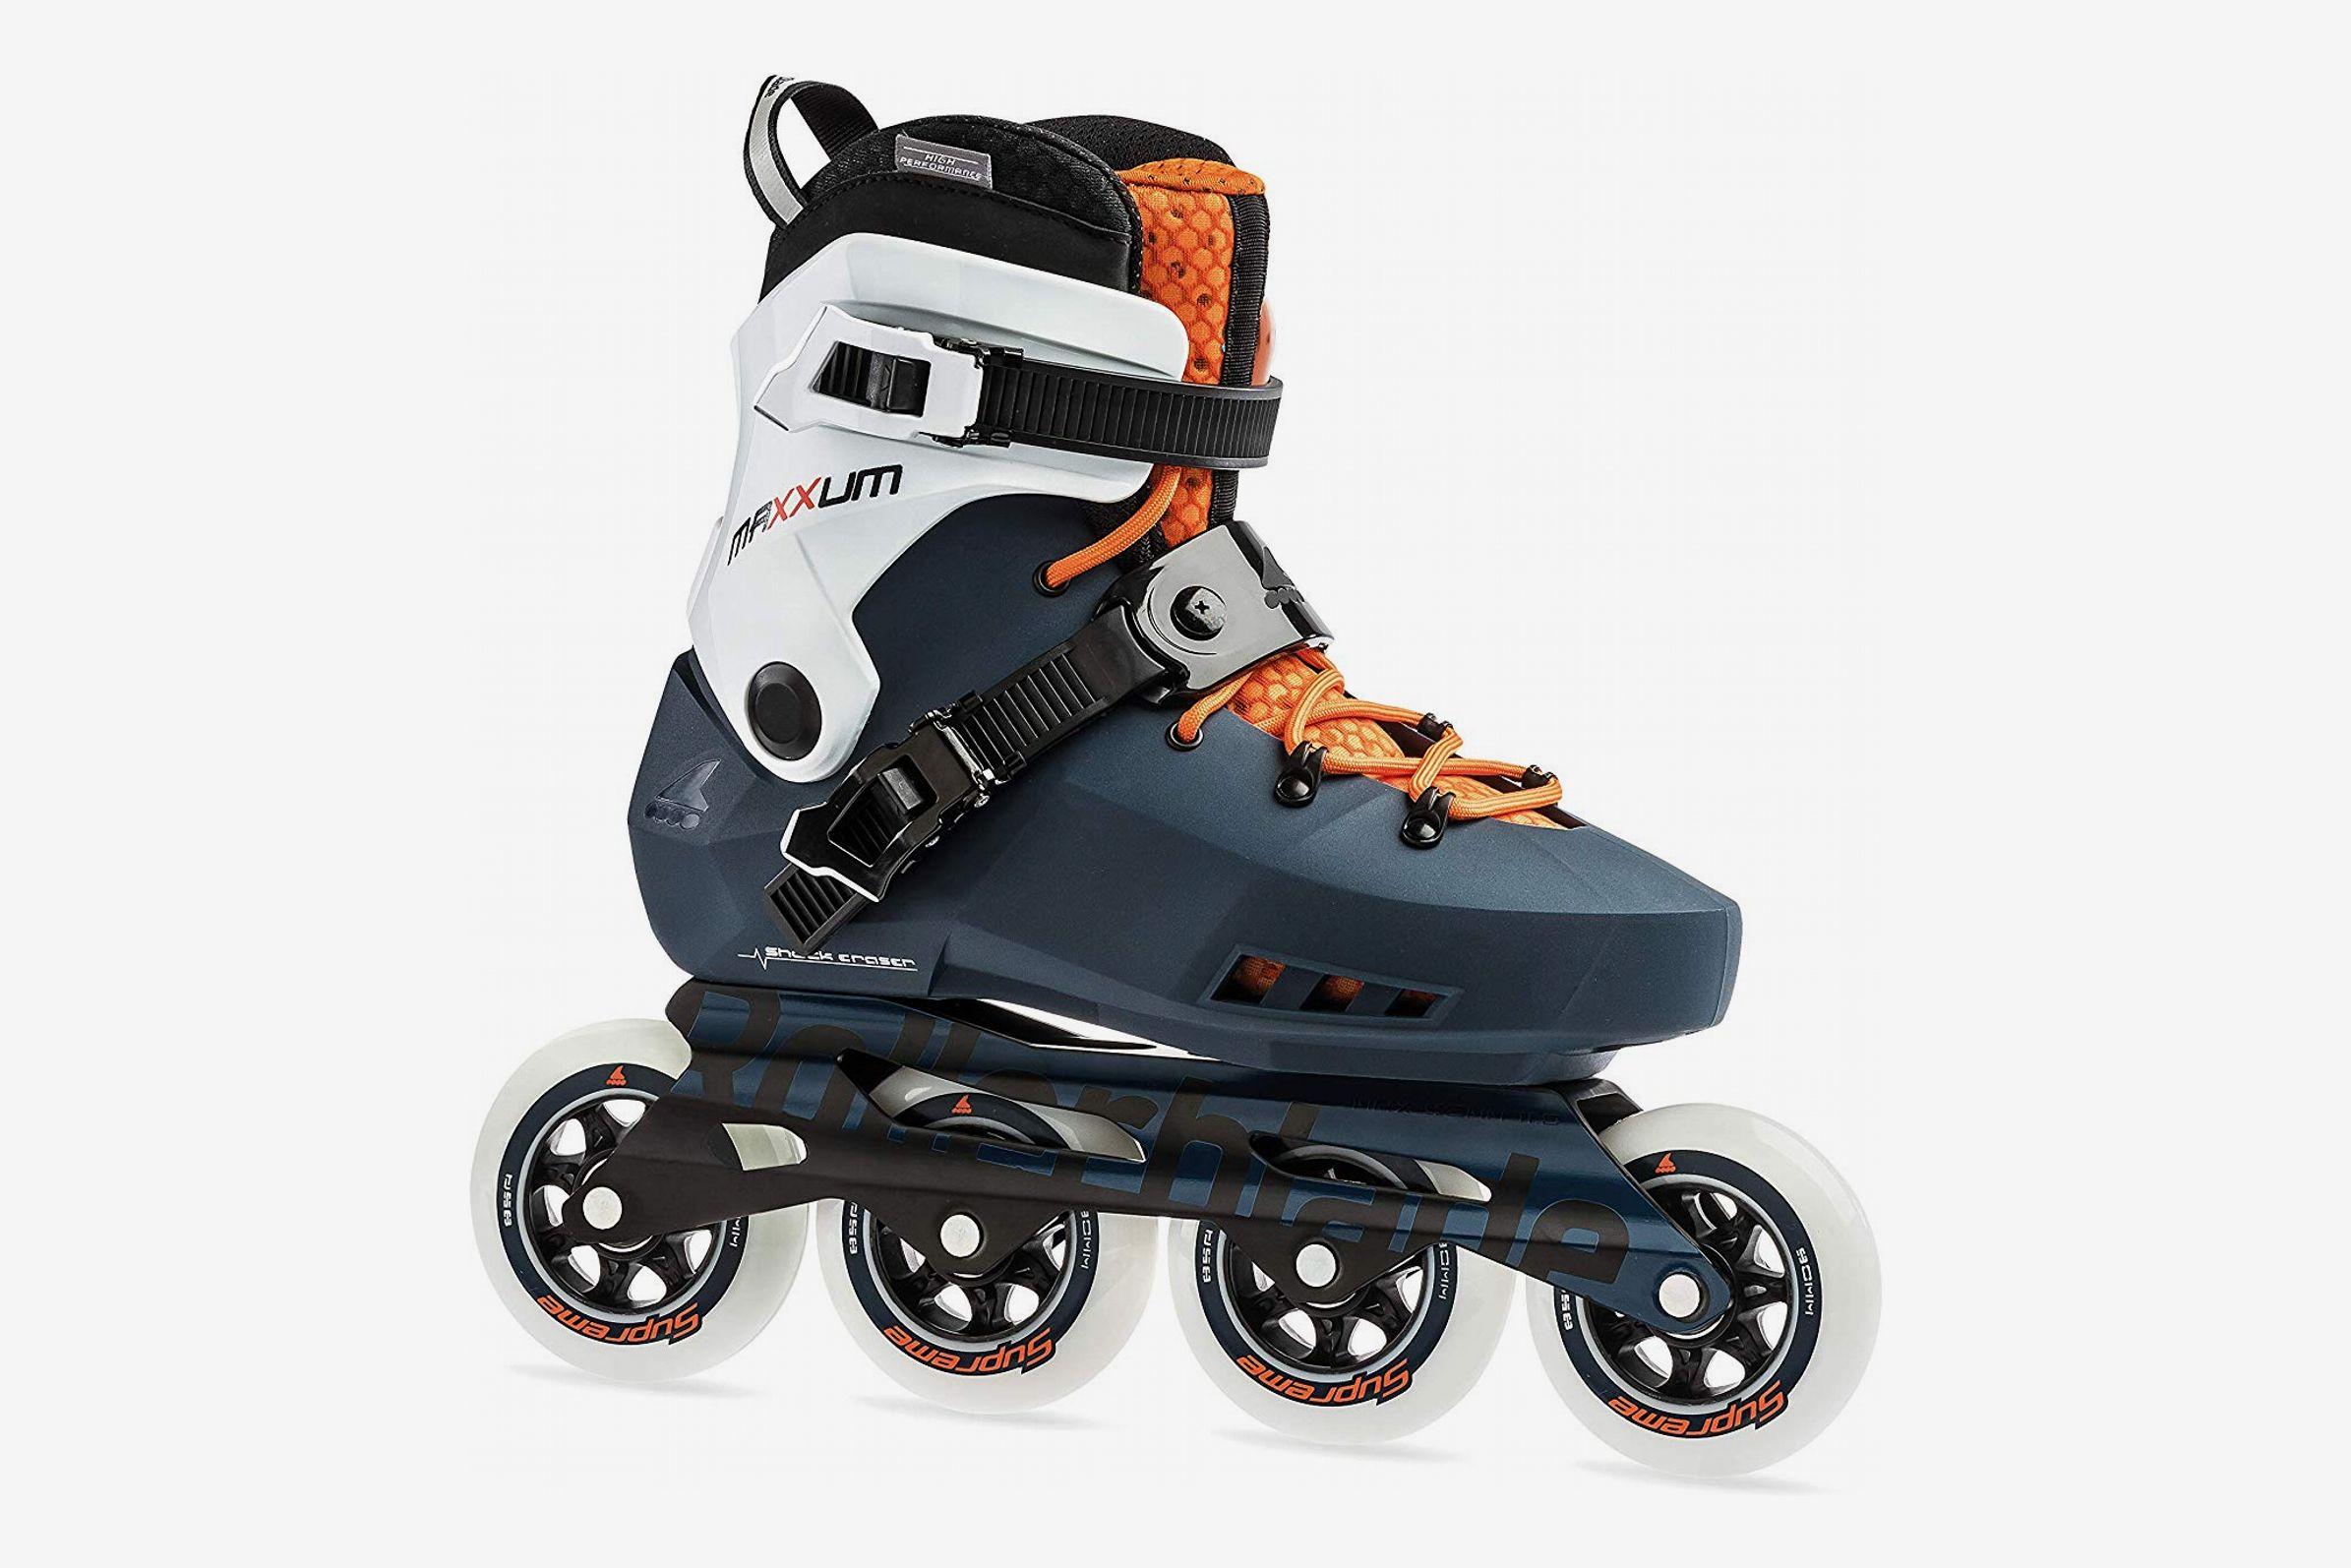 521afaf5e58 Rollerblade Maxxum Edge 90 Men's Inline Skates